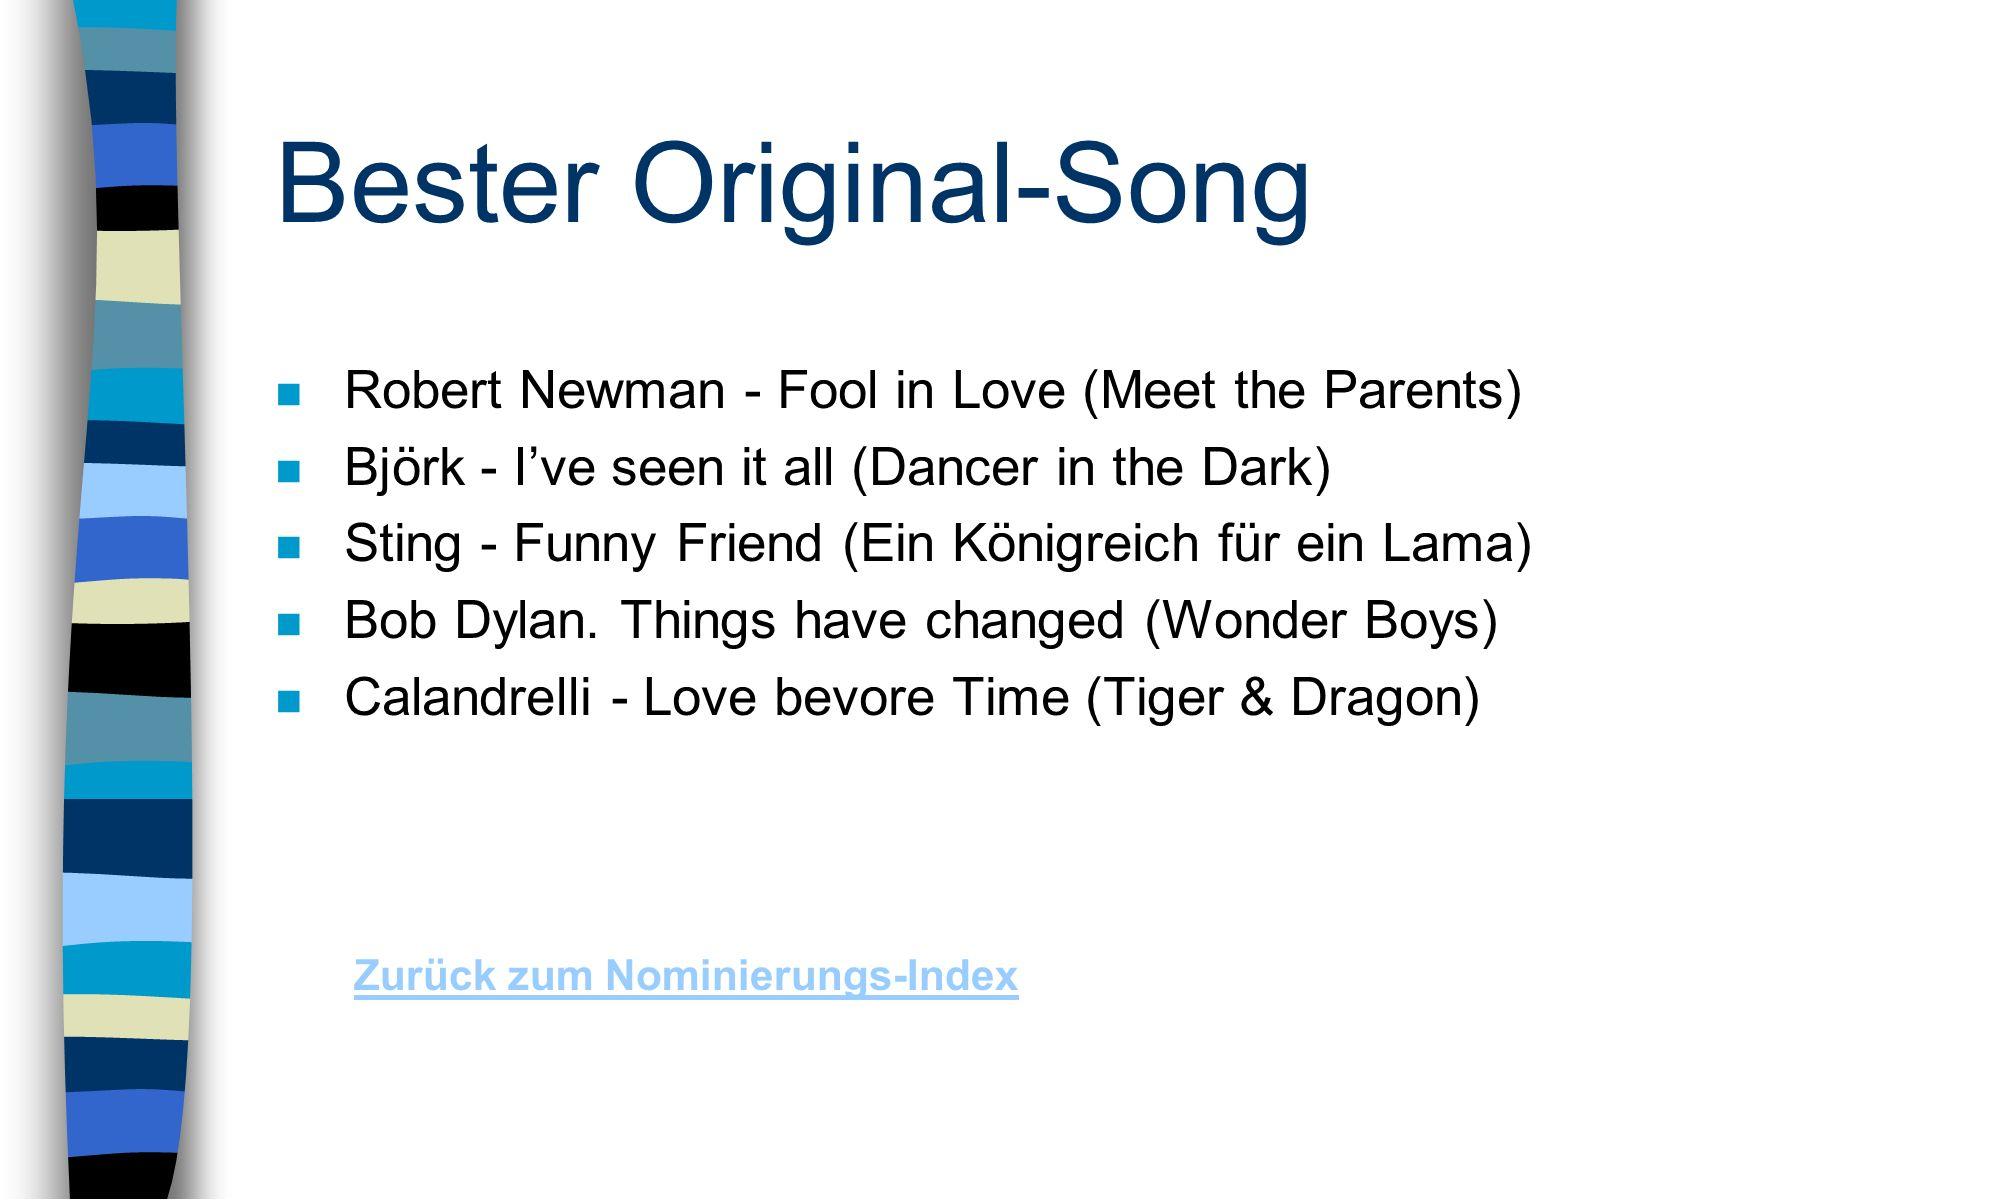 Bester Original-Song n Robert Newman - Fool in Love (Meet the Parents) n Björk - Ive seen it all (Dancer in the Dark) n Sting - Funny Friend (Ein Königreich für ein Lama) n Bob Dylan.